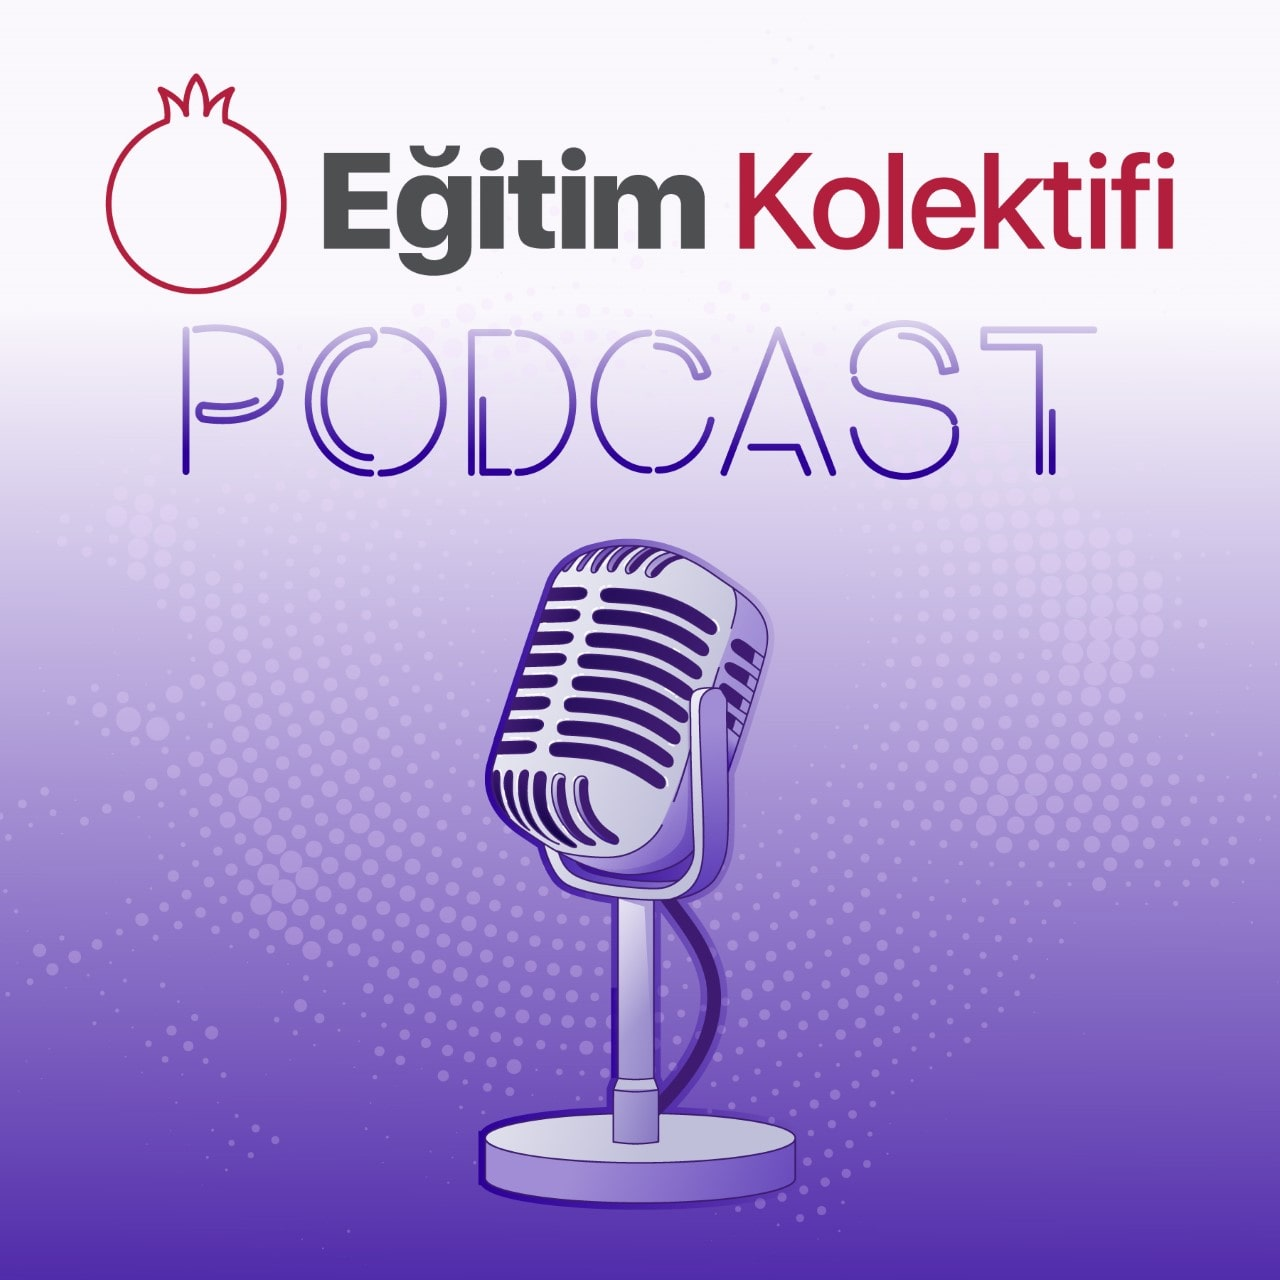 eğitim kolektifi podcast